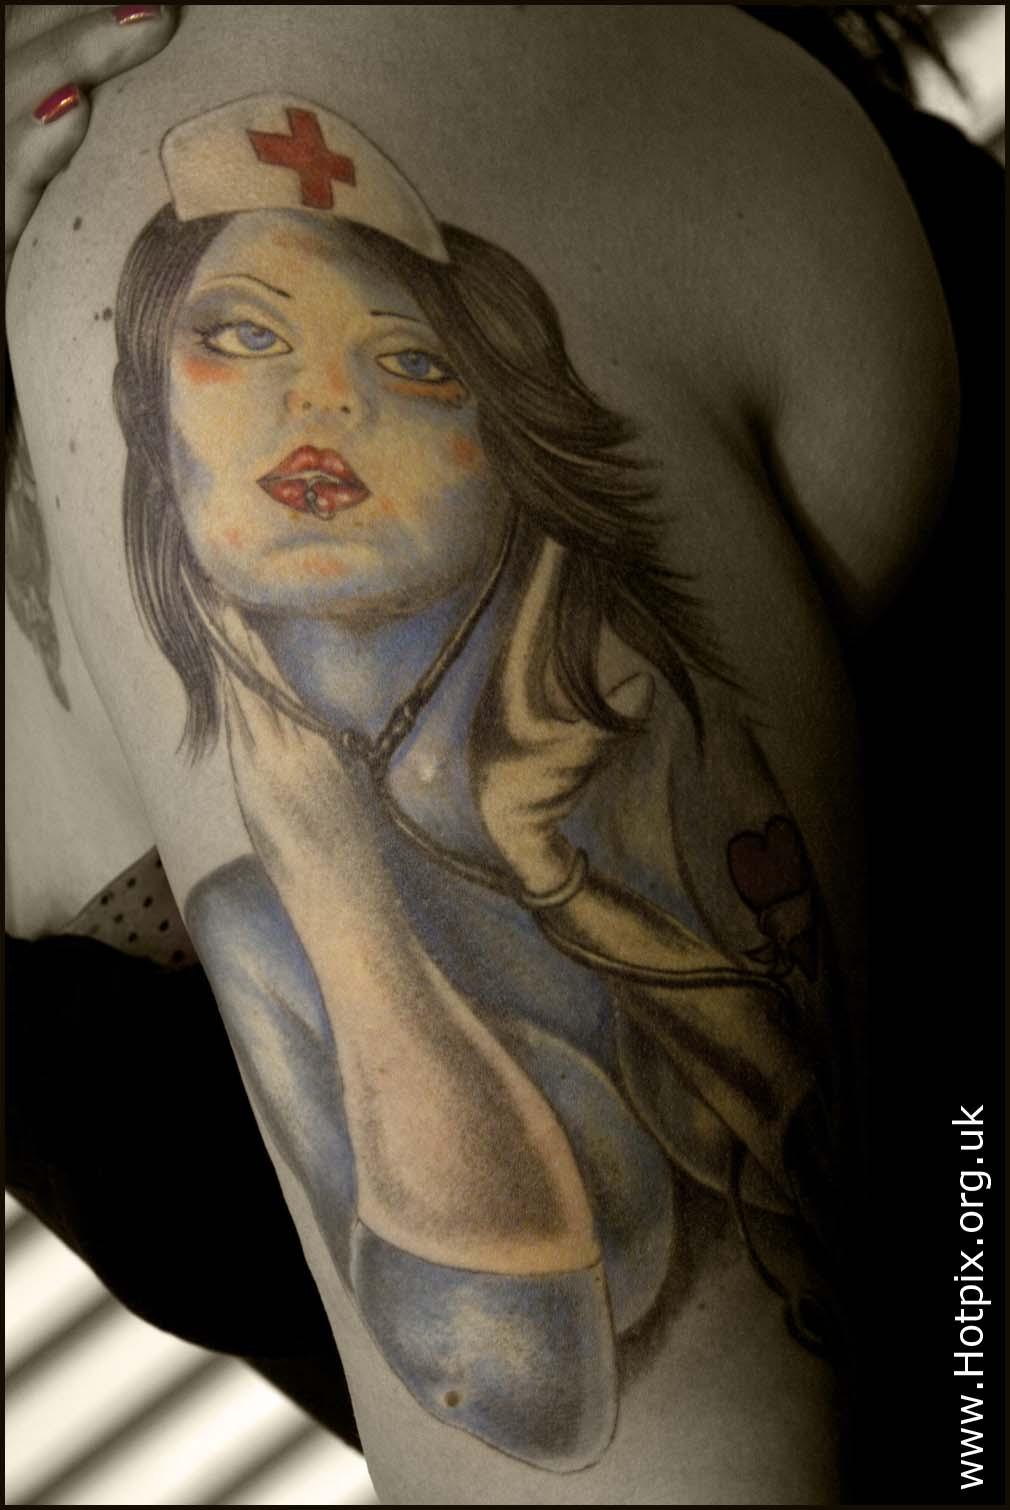 nurse,sister,hospital,tattoo,erotic,lady,woman,exotic,ink,female,arm,skin,flesh,canvas,tat2,tatoo,tatto,blue,breasts,red,lips,pierced,ring,piece,beautiful,manchester,convention,exhibition,gmex,england,britain,UK,europe,artist,art,medic,medical,surgery,surgical,sex,fetish,shop,Tatuada,tats,bodyart,body,dark,disturbia,interesting,people,person,persons,persona,interesante,tatouage,color,selectivo,couleur,s\u00e9lective,vorgew\u00e4hlte,Farbe,arty,muchacha,femenina,de,la,mujer,se\u00f1ora,girl,\u5973\u6027\u30e1\u30b9\u306e\u5973\u6027\u306e\u5973\u306e\u5b50,hotpix!,altfashion